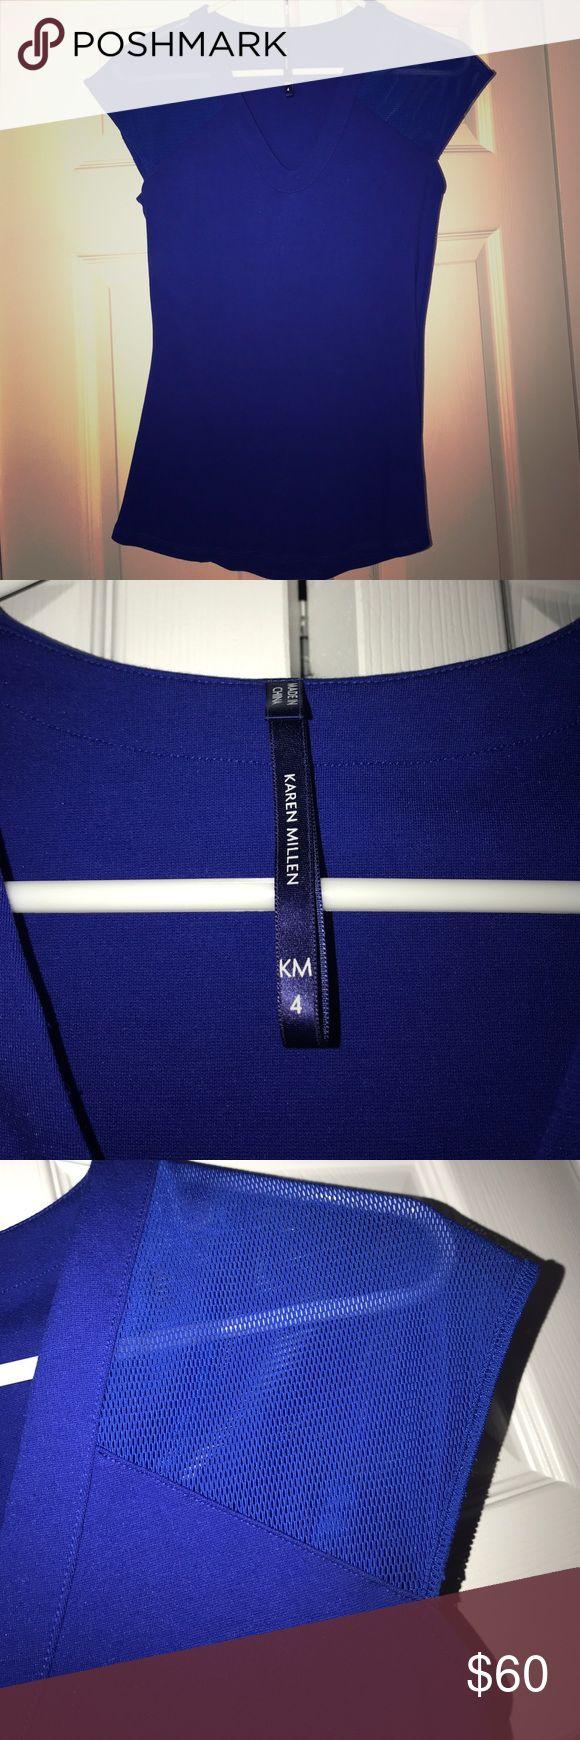 Karen Millen T Royal Blue Karen Miller T- shirt Karen Millen Tops Tees - Short Sleeve